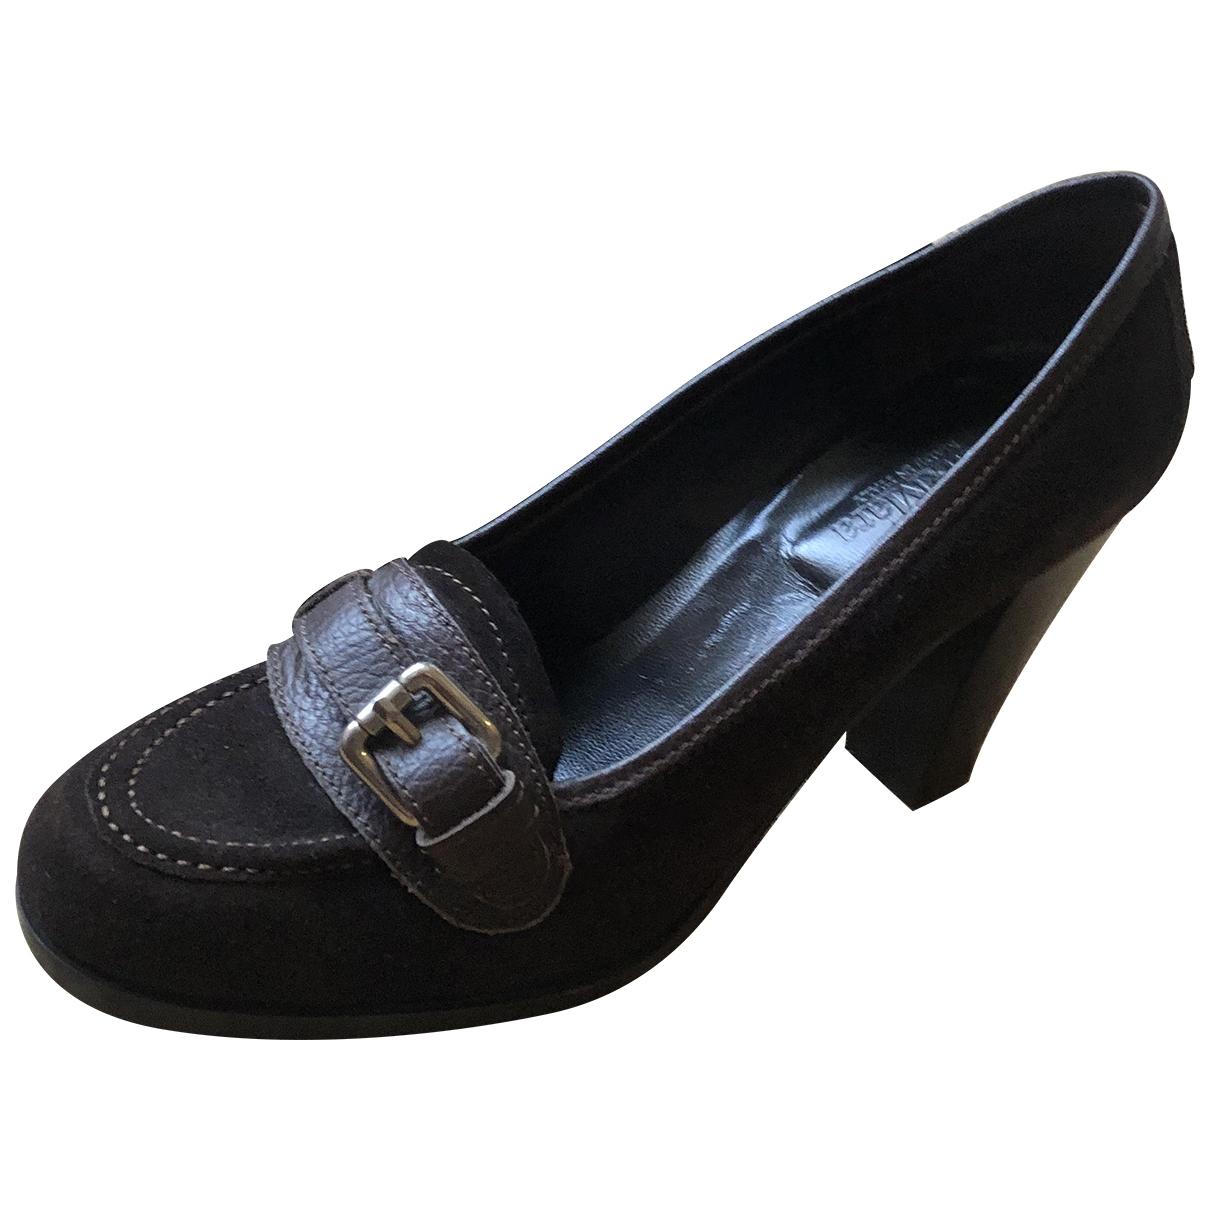 Max Mara \N Brown Leather Heels for Women 39 EU